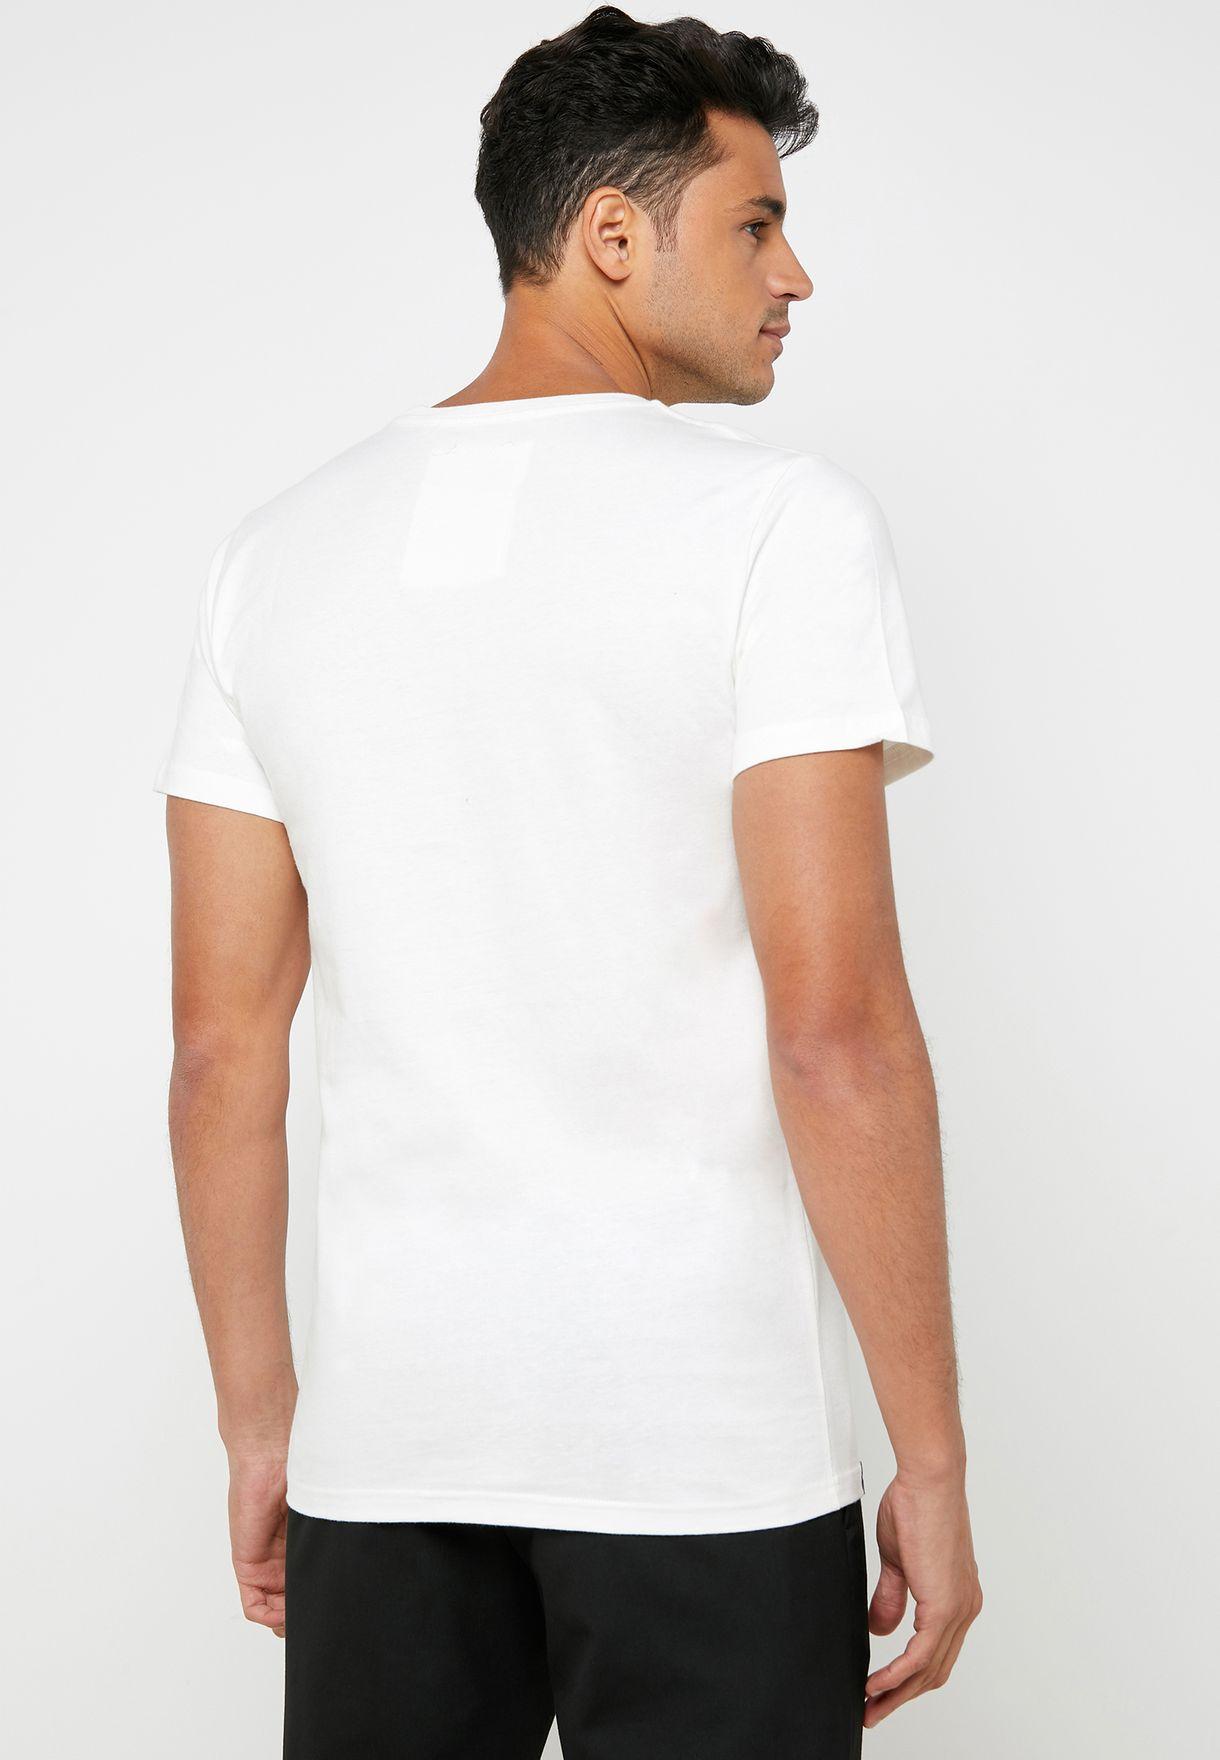 Stockholm Rocky Balboa Crew Neck T-Shirt